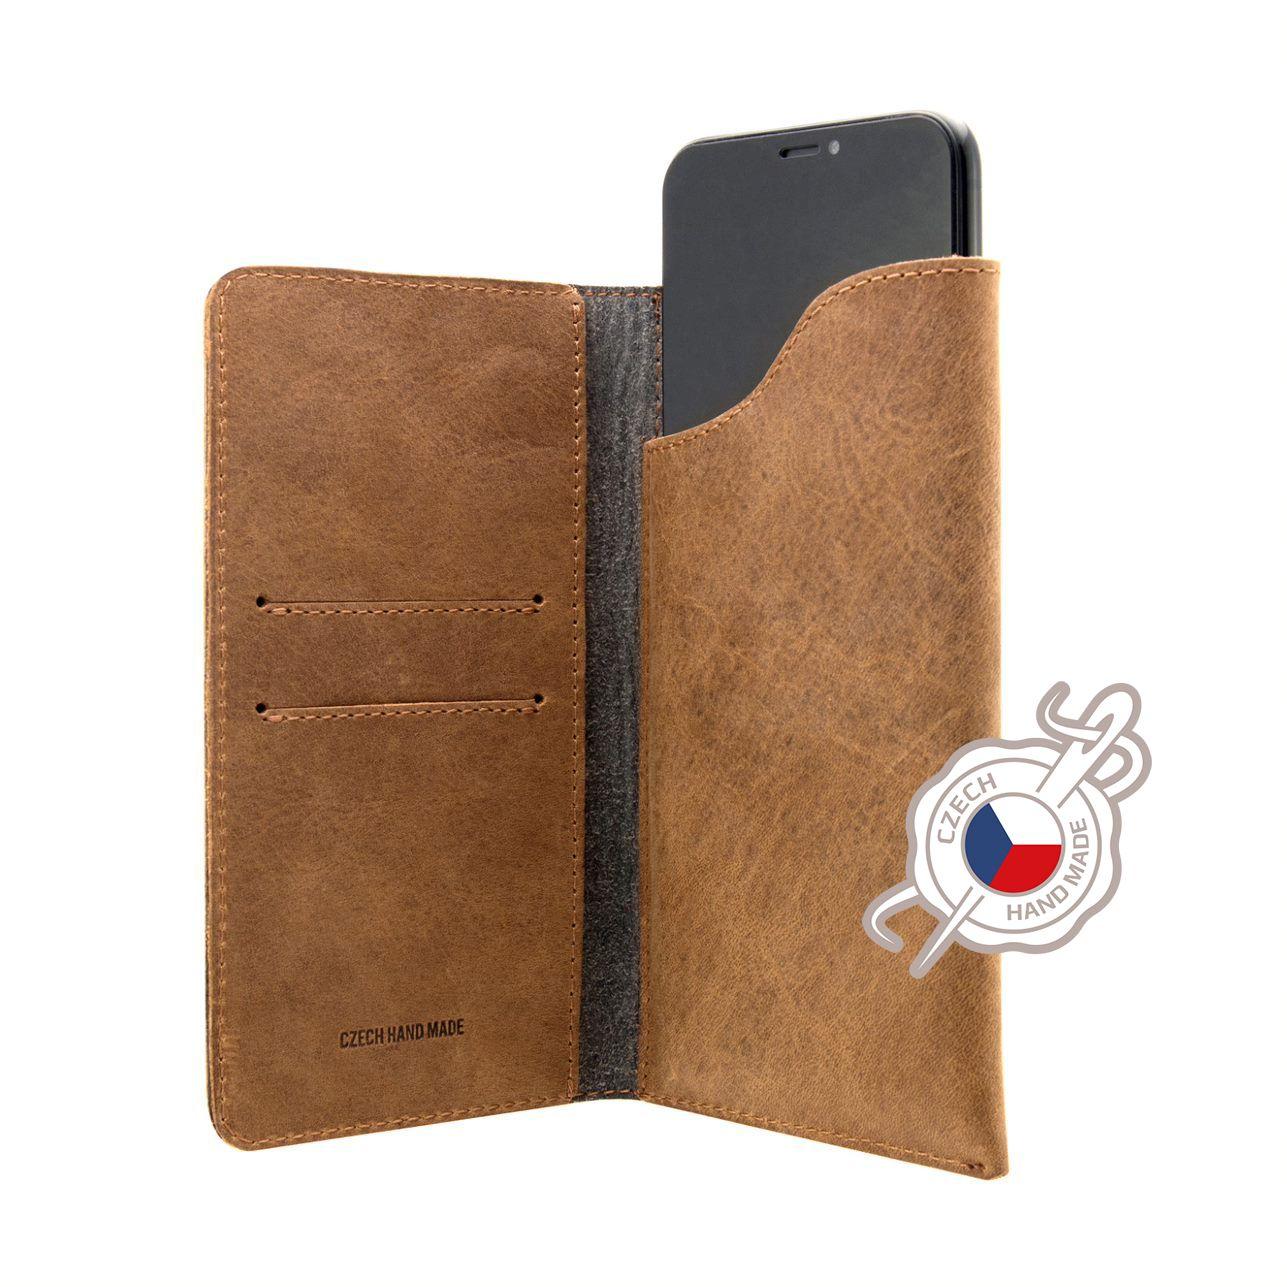 Kožené pouzdro FIXED Pocket Book pro Apple iPhone 6 Plus/6S Plus/7 Plus/8 Plus/XS Max/11 Pro Max, hnědé